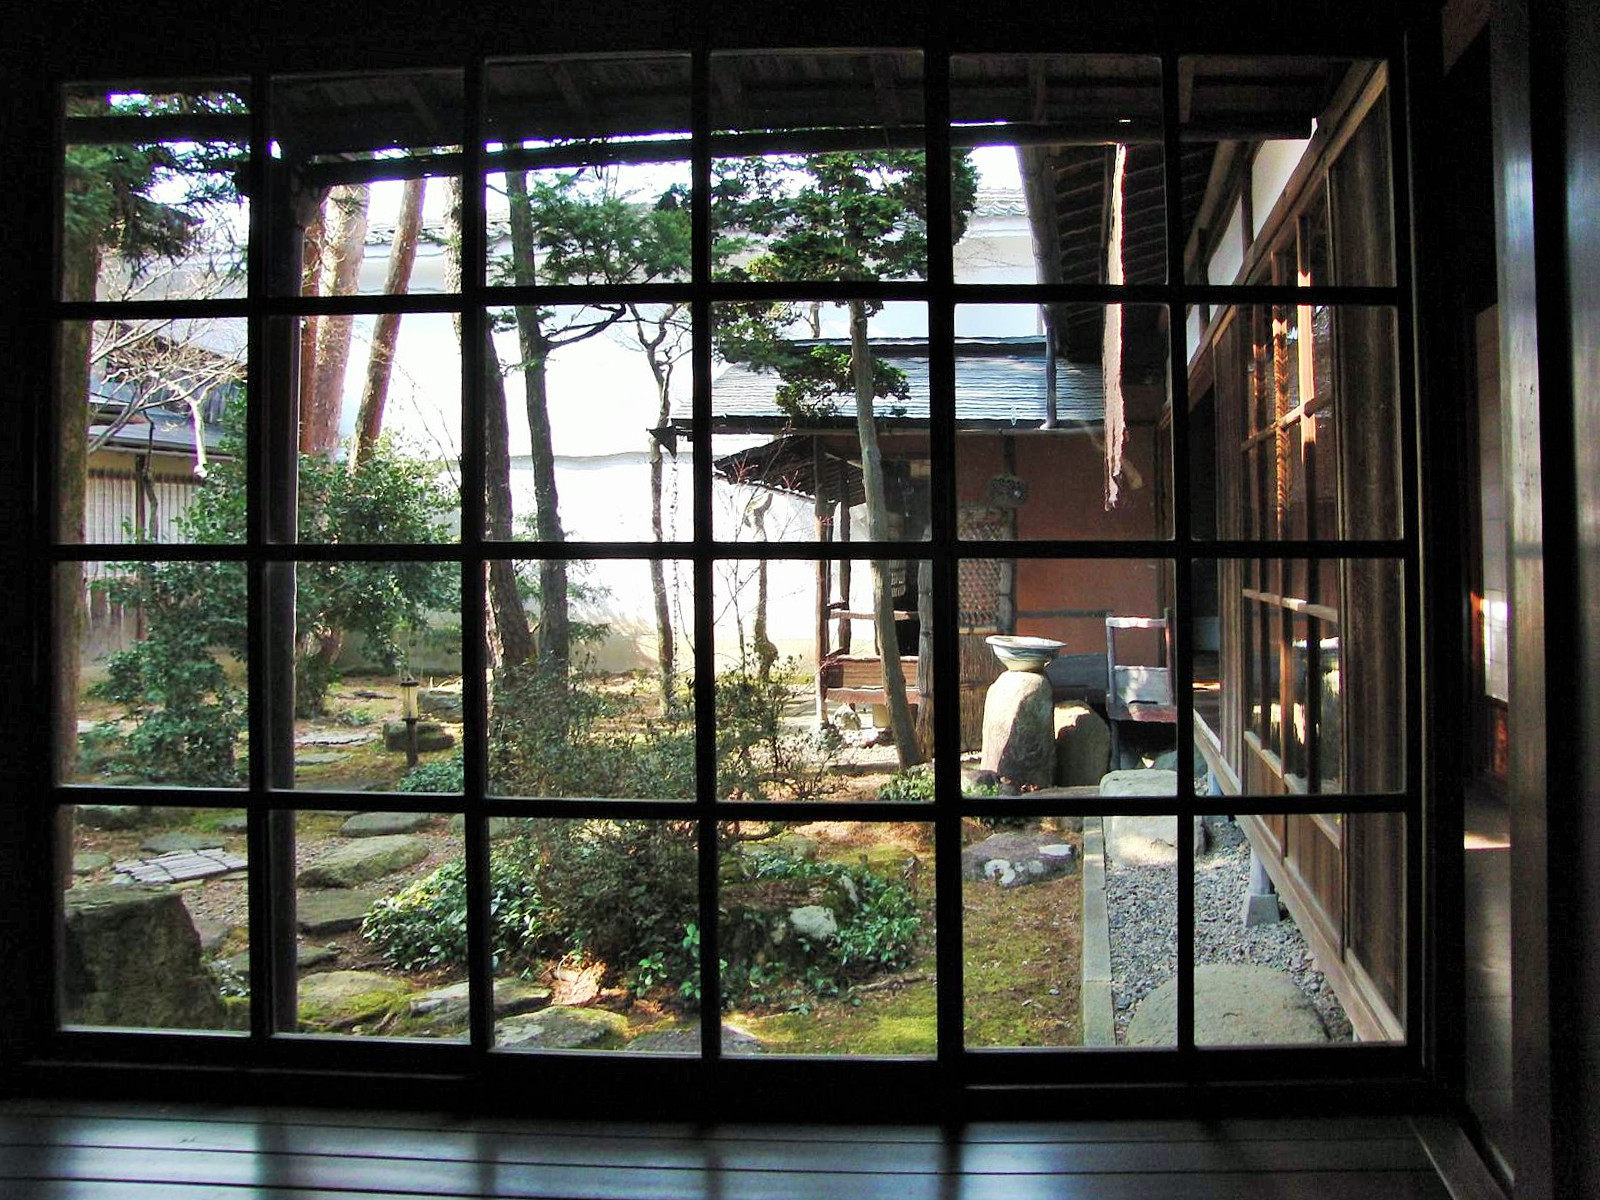 file takayama le jardin zen de la maison wikimedia commons. Black Bedroom Furniture Sets. Home Design Ideas